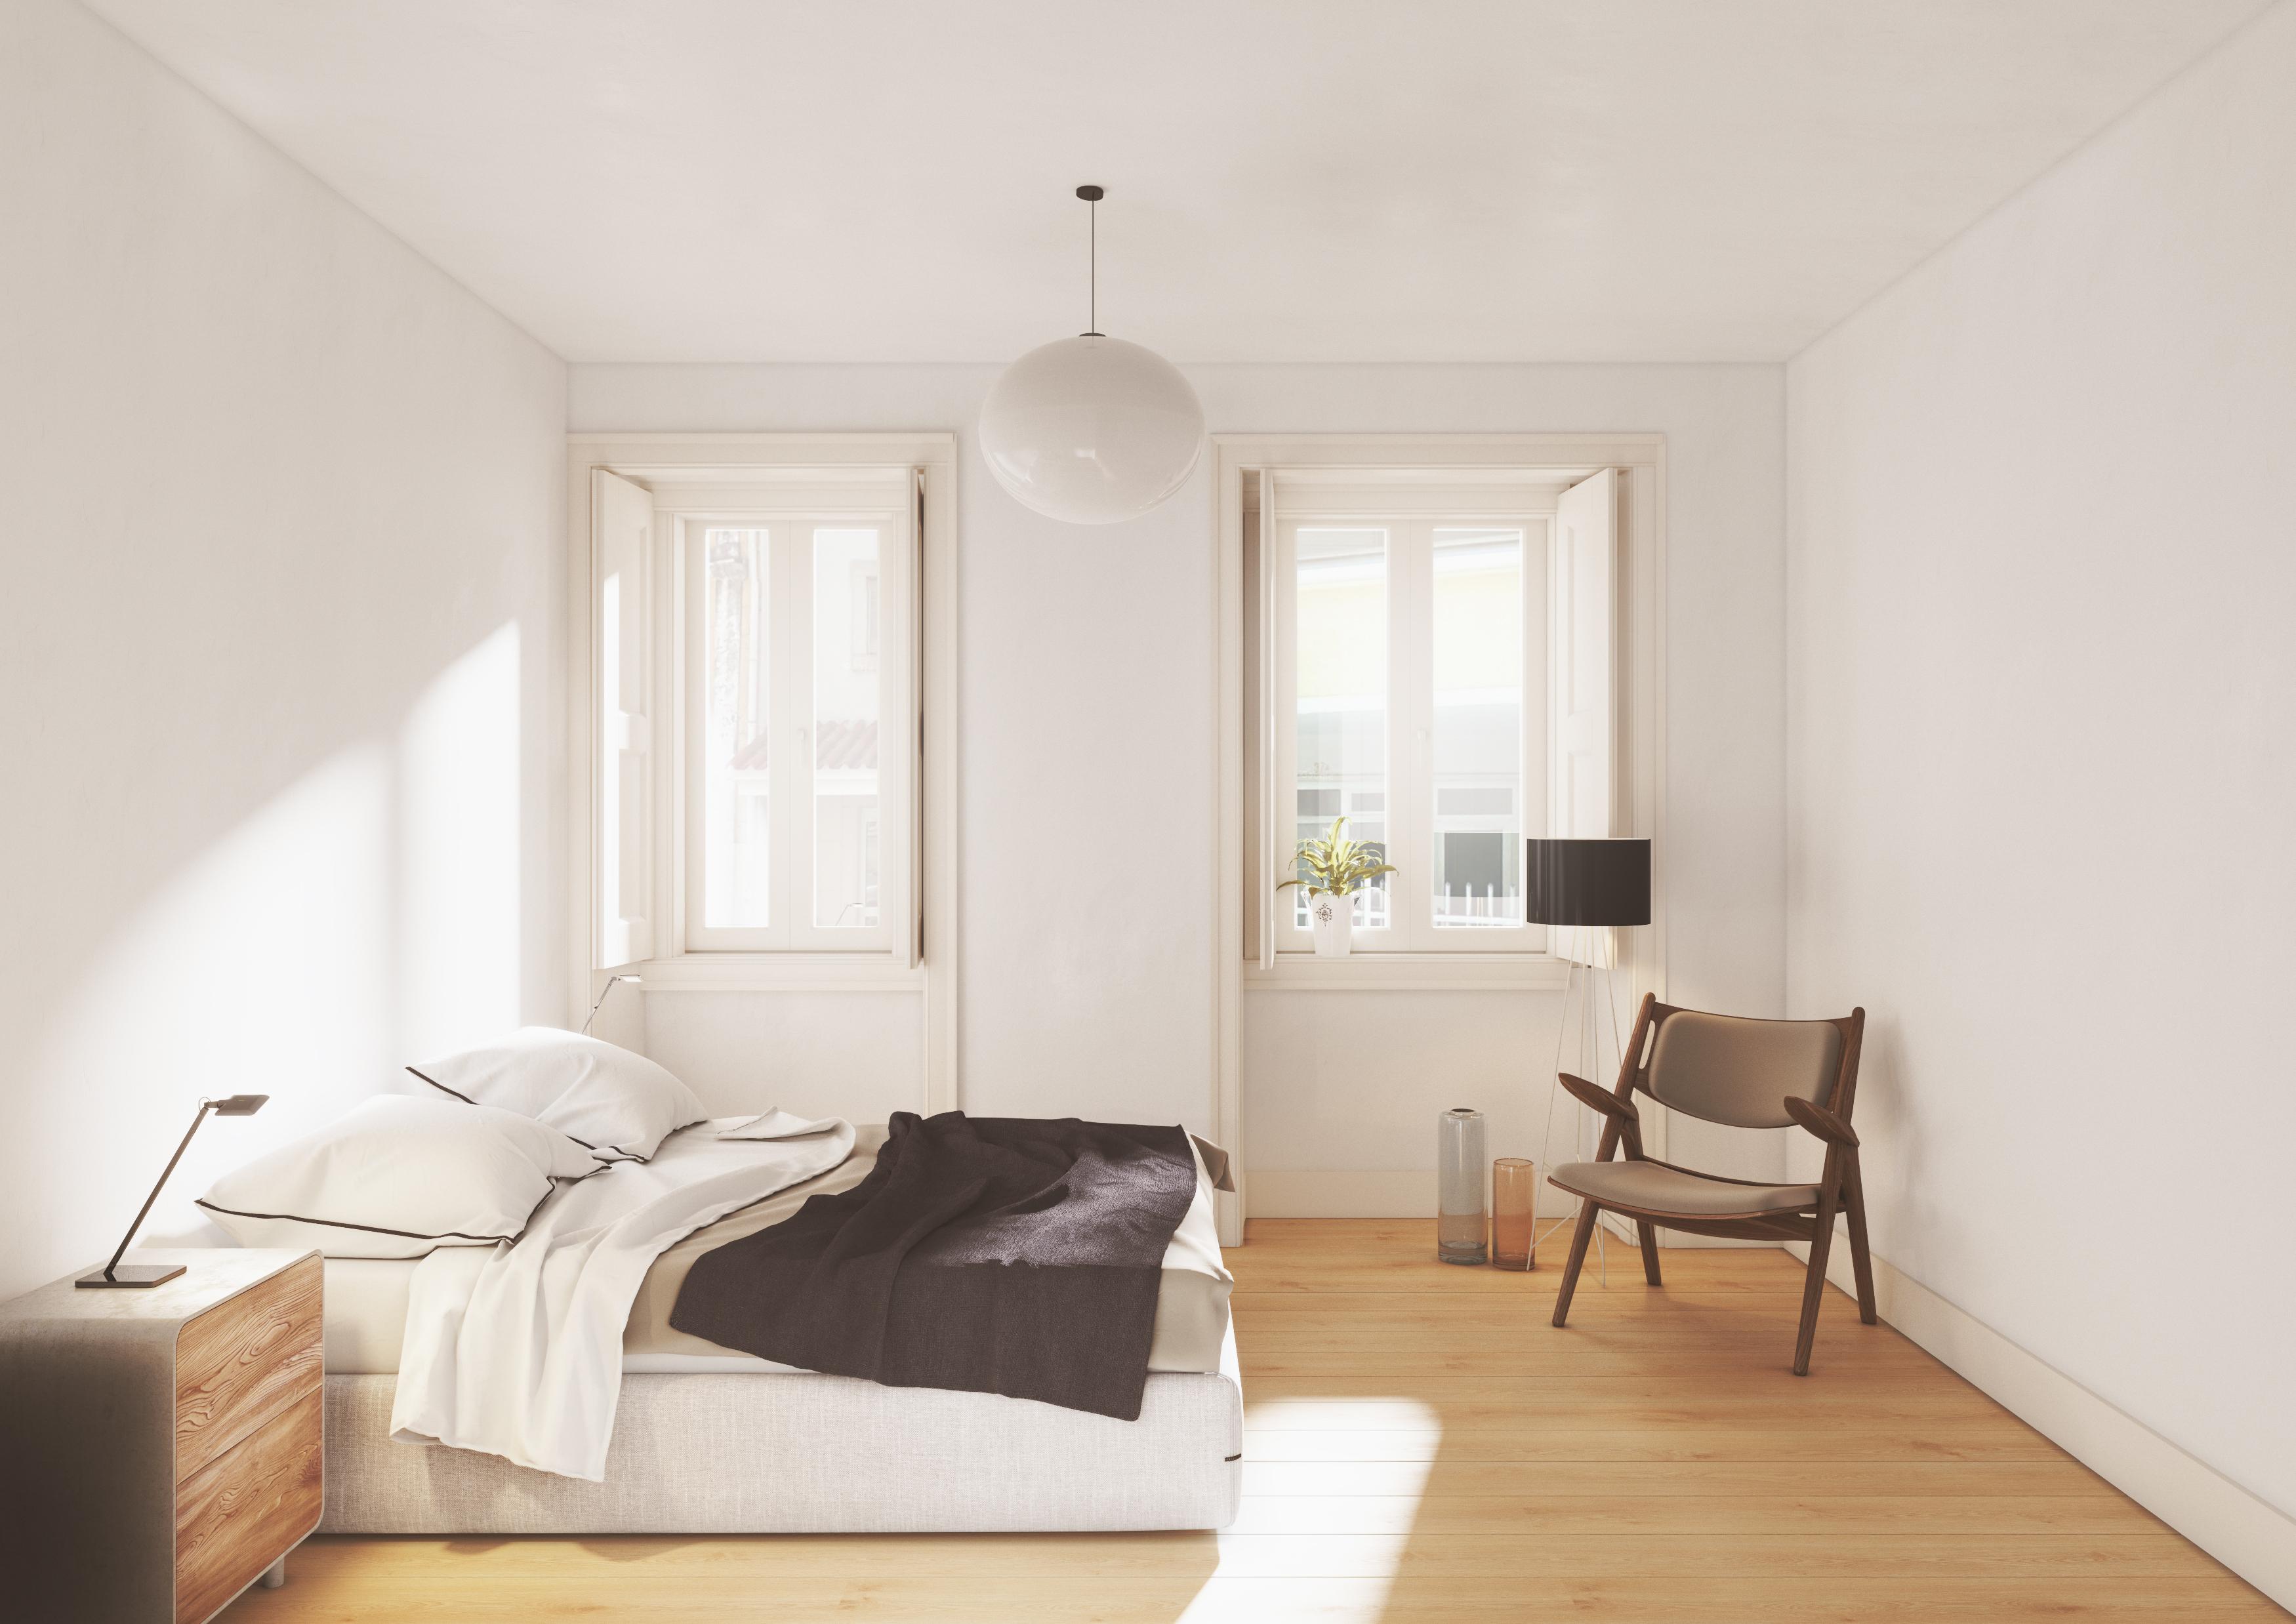 pf14499-apartamento-t2-lisboa-2